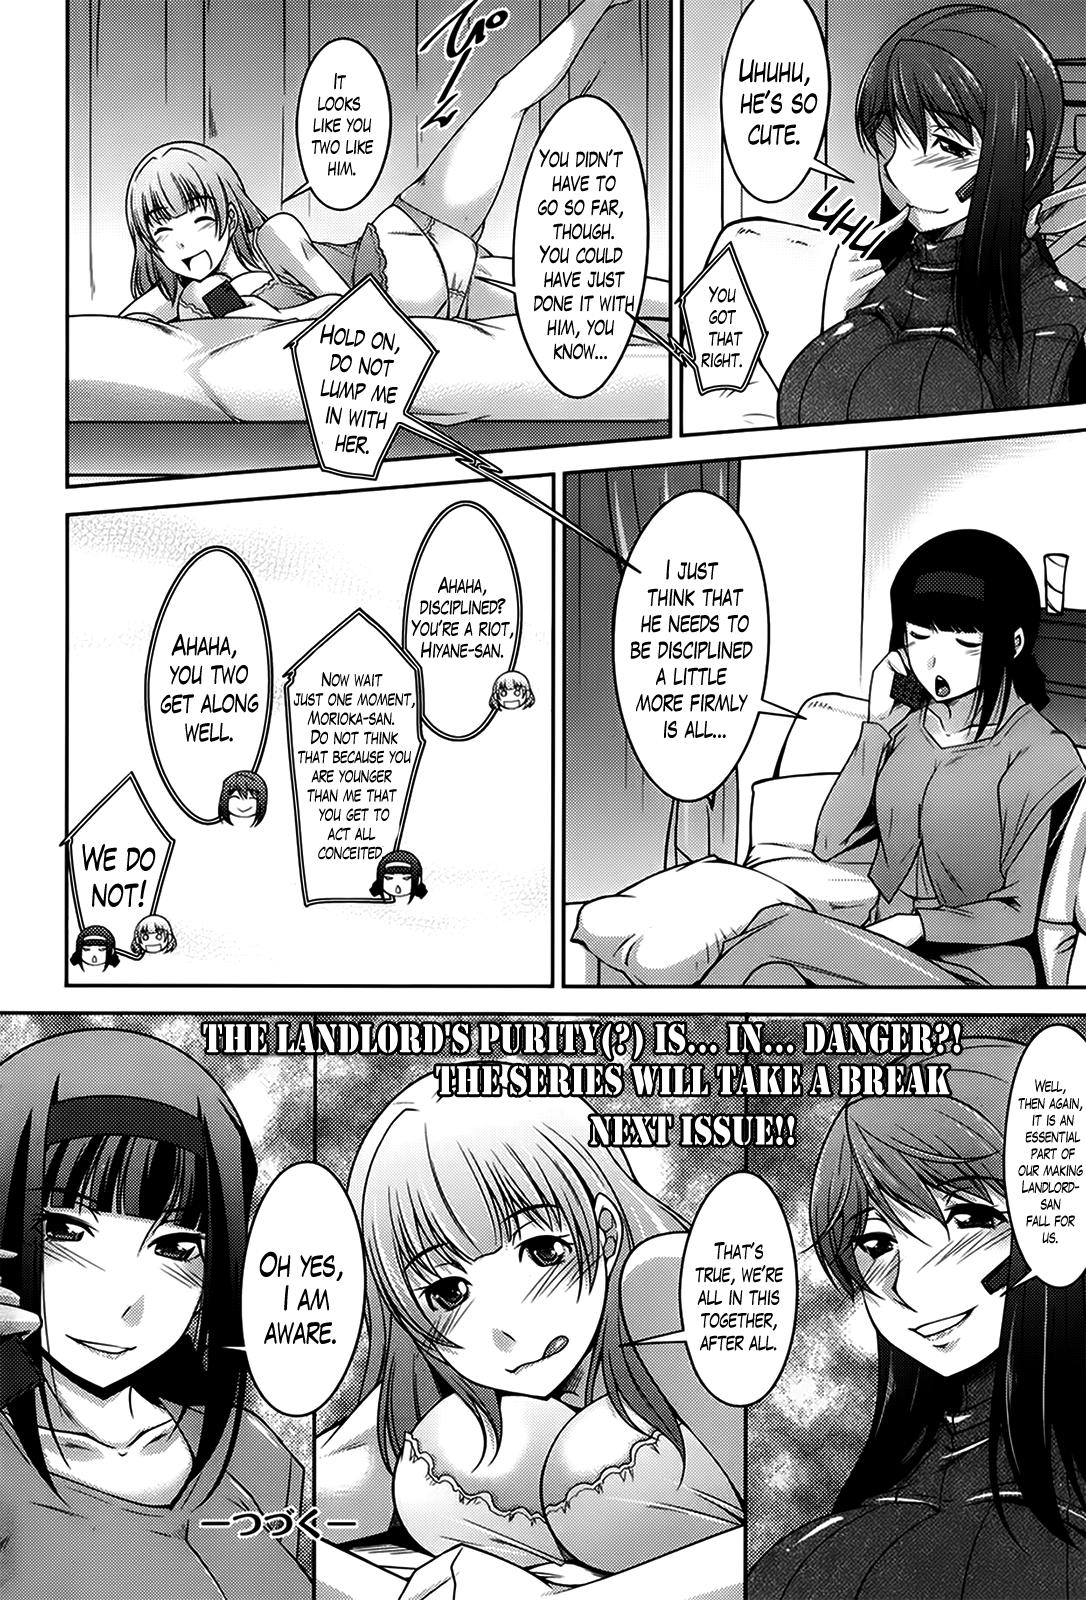 [Zen9] Taikutsu na Gogo no Sugoshikata Ch. 1-5   A Way to Spend a Boring Afternoon Ch. 1-5 (Action Pizazz DX 2013-12) [English](hentai2read.com)[Lazarus H] 75